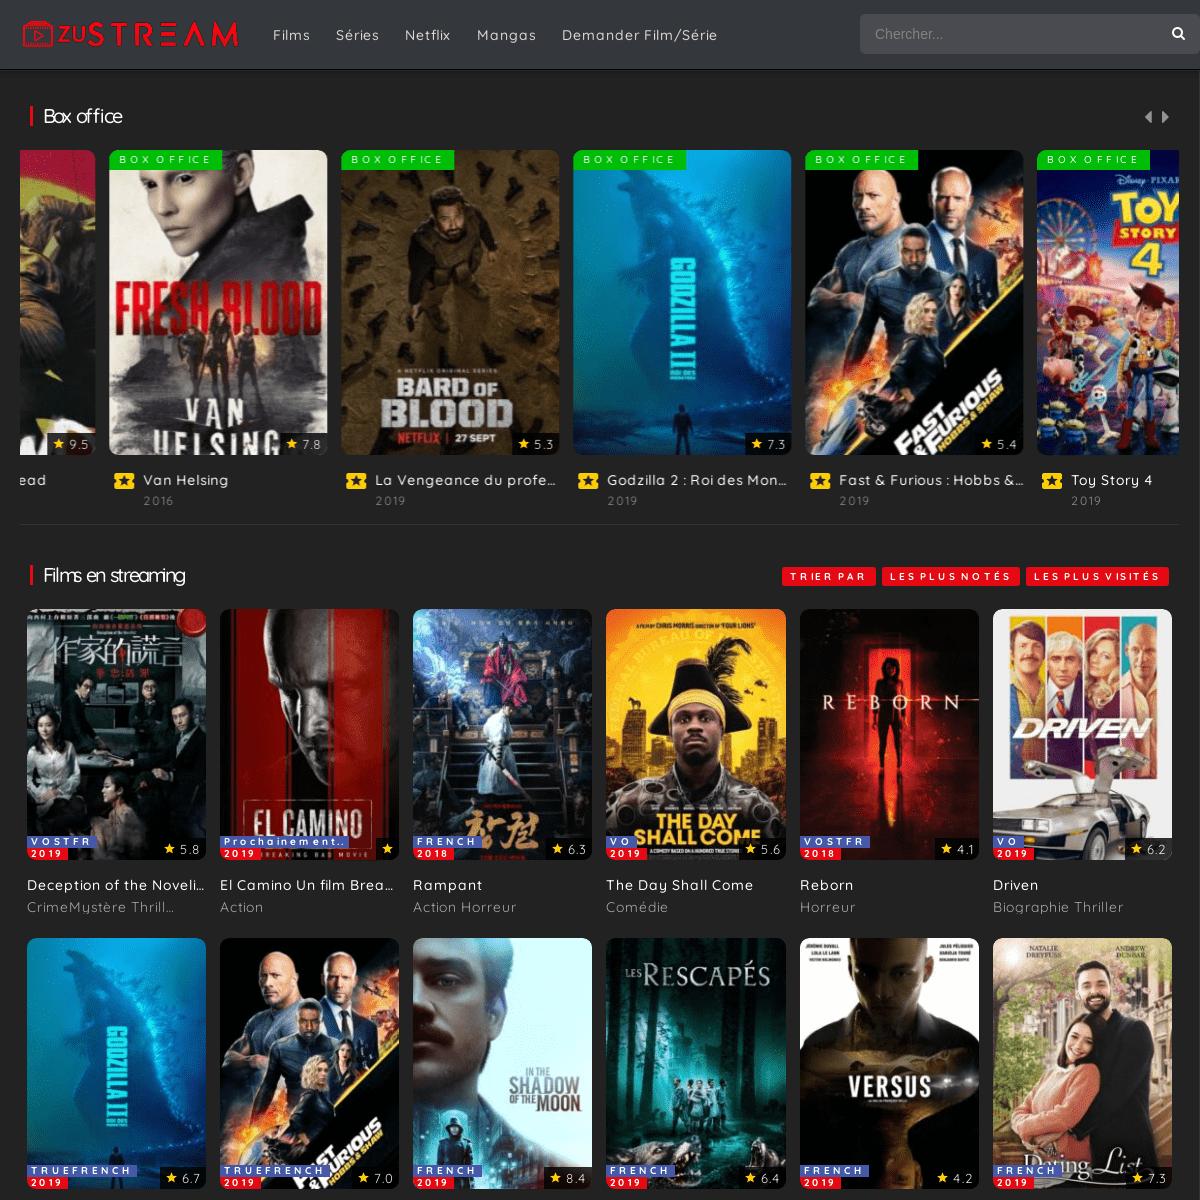 zuStream - Films streaming gratuit en VF, séries et mangas ...